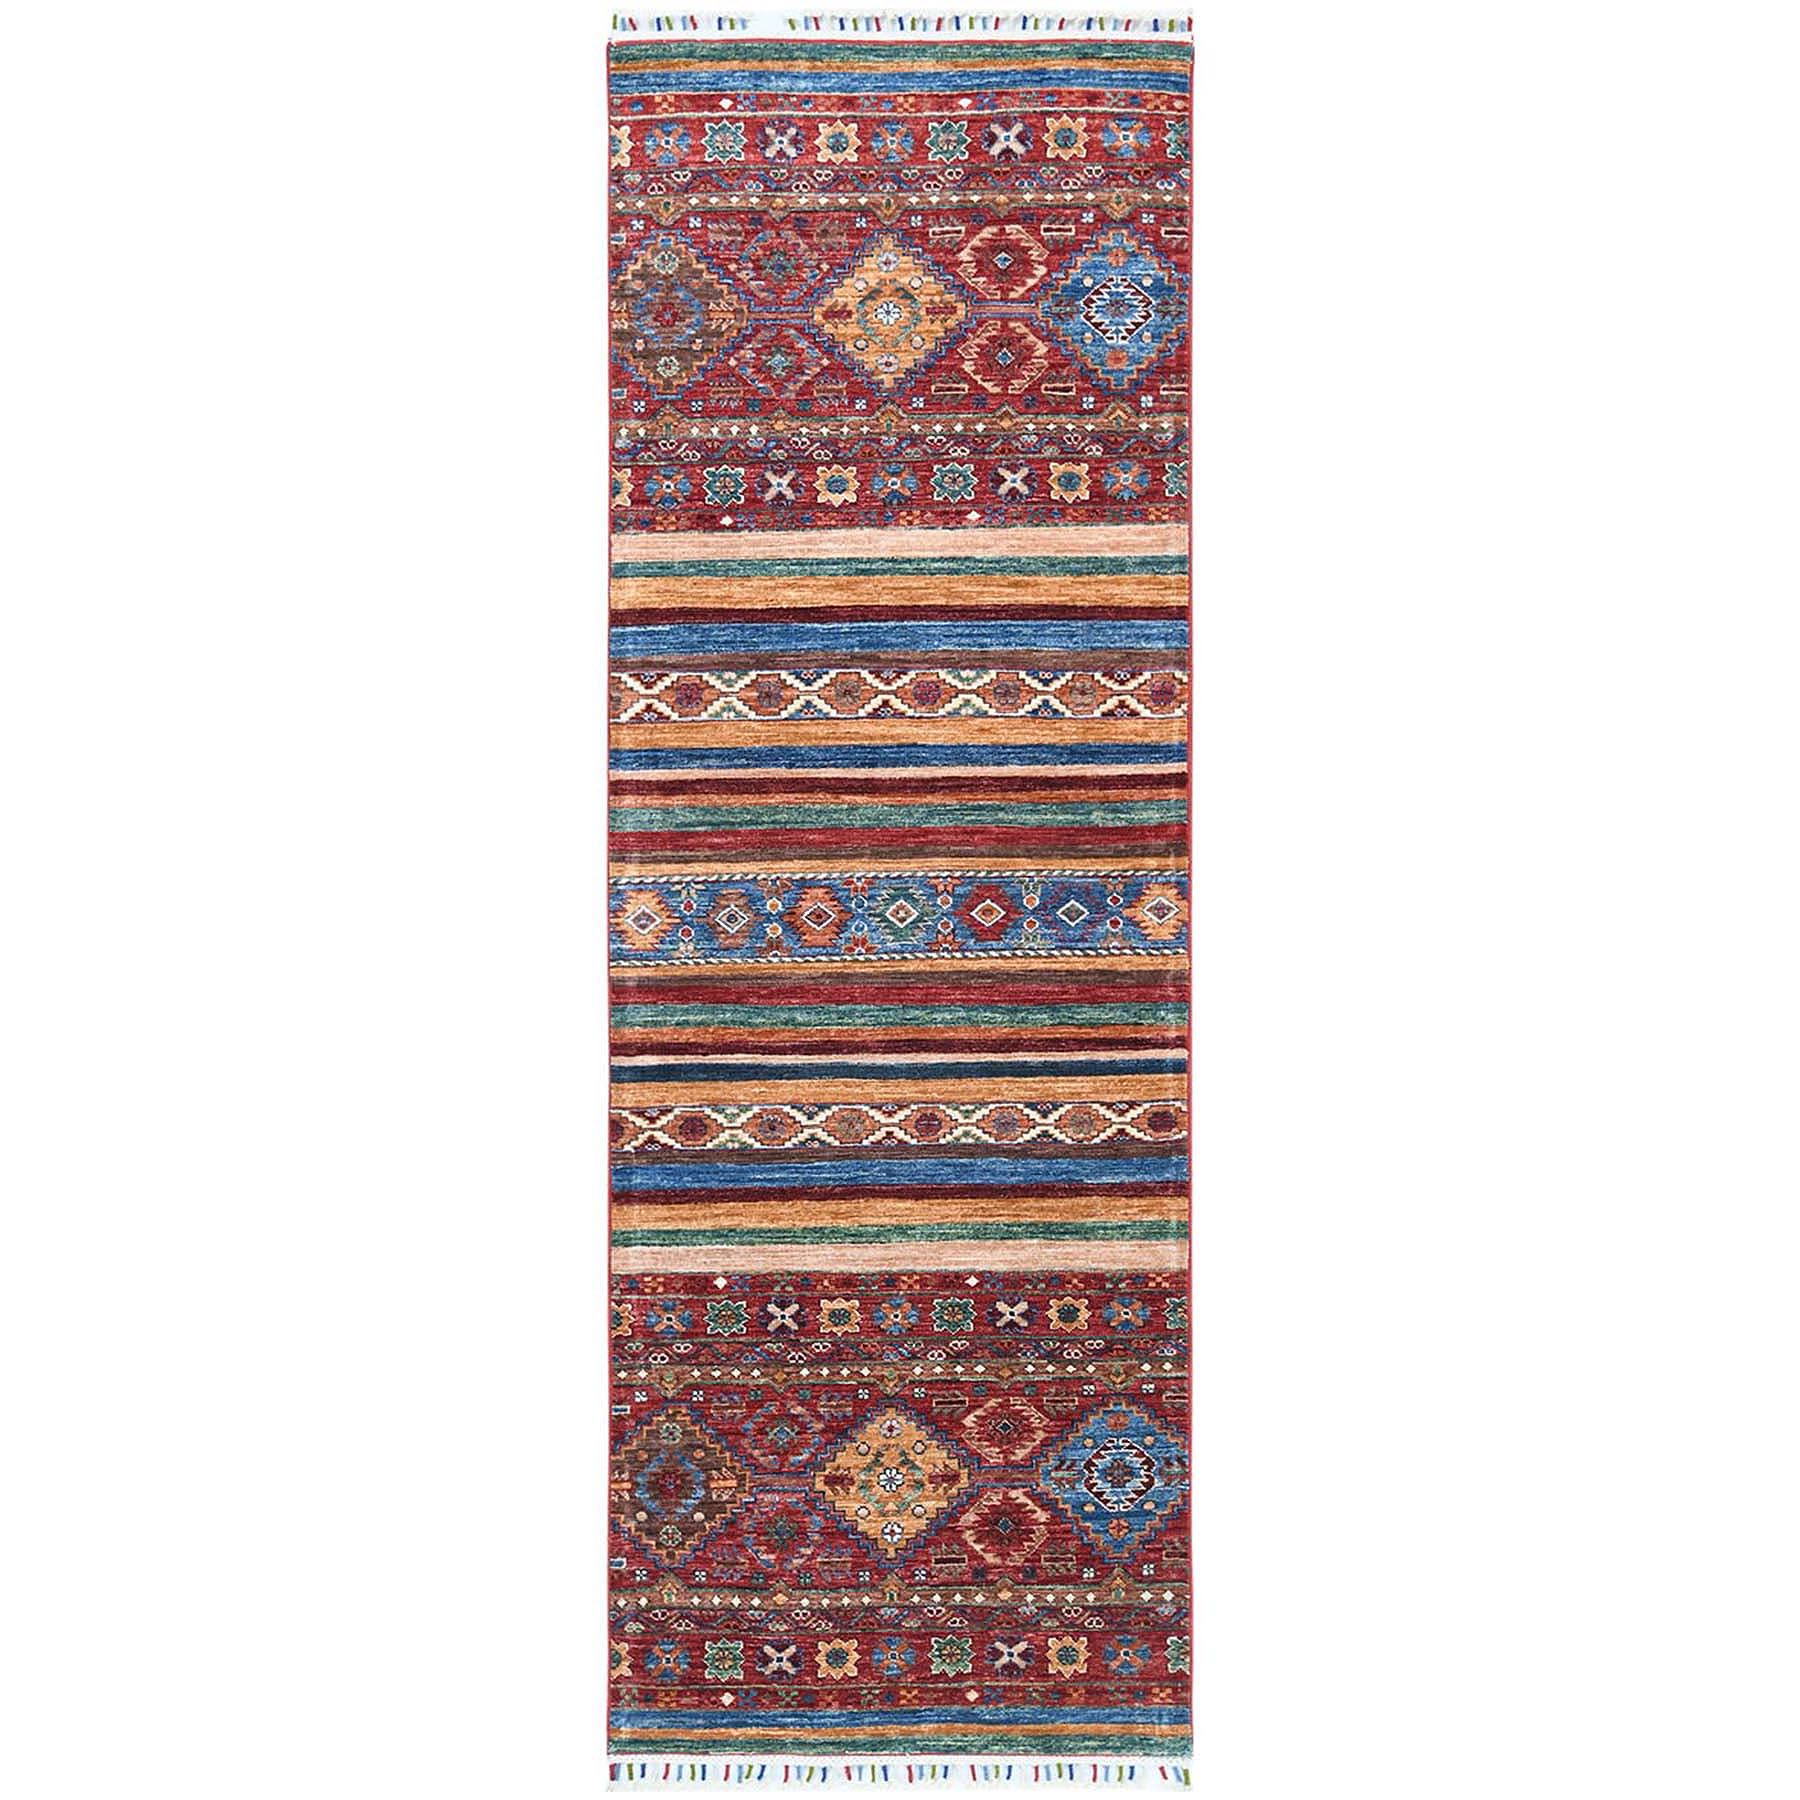 "2'8""x8'1"" Red Super Kazak Khorjin Design With Colorful Tassles Soft Velvety Wool Hand Knotted Oriental Runner Rug"